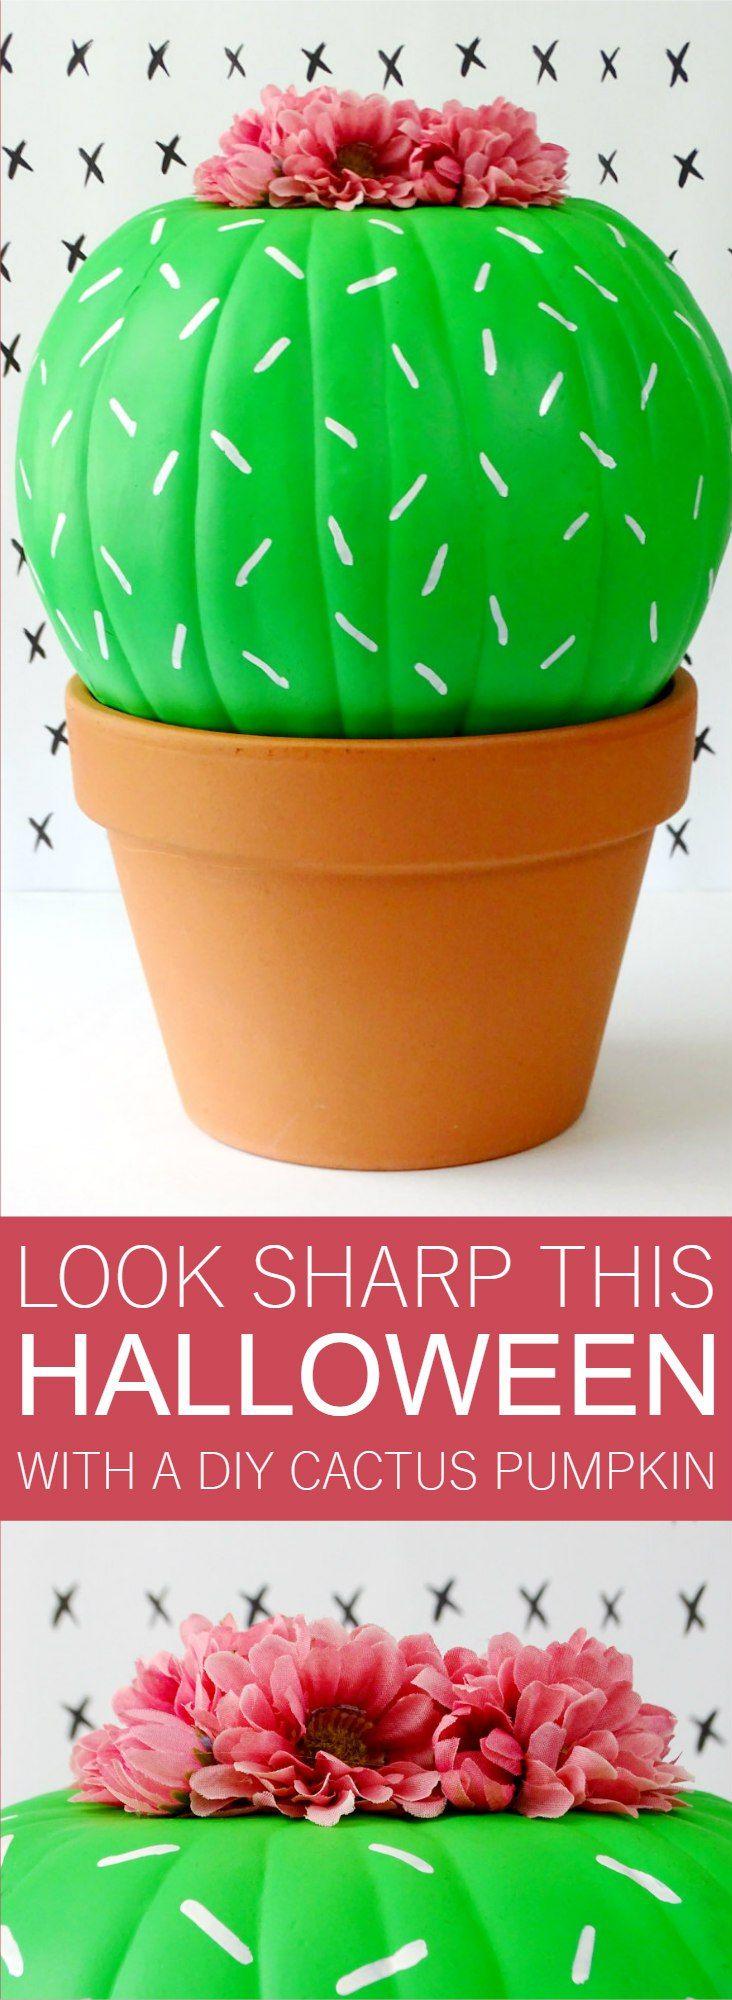 Look Sharp This Halloween with a DIY Cactus Pumpkin - Living La Vida Holoka